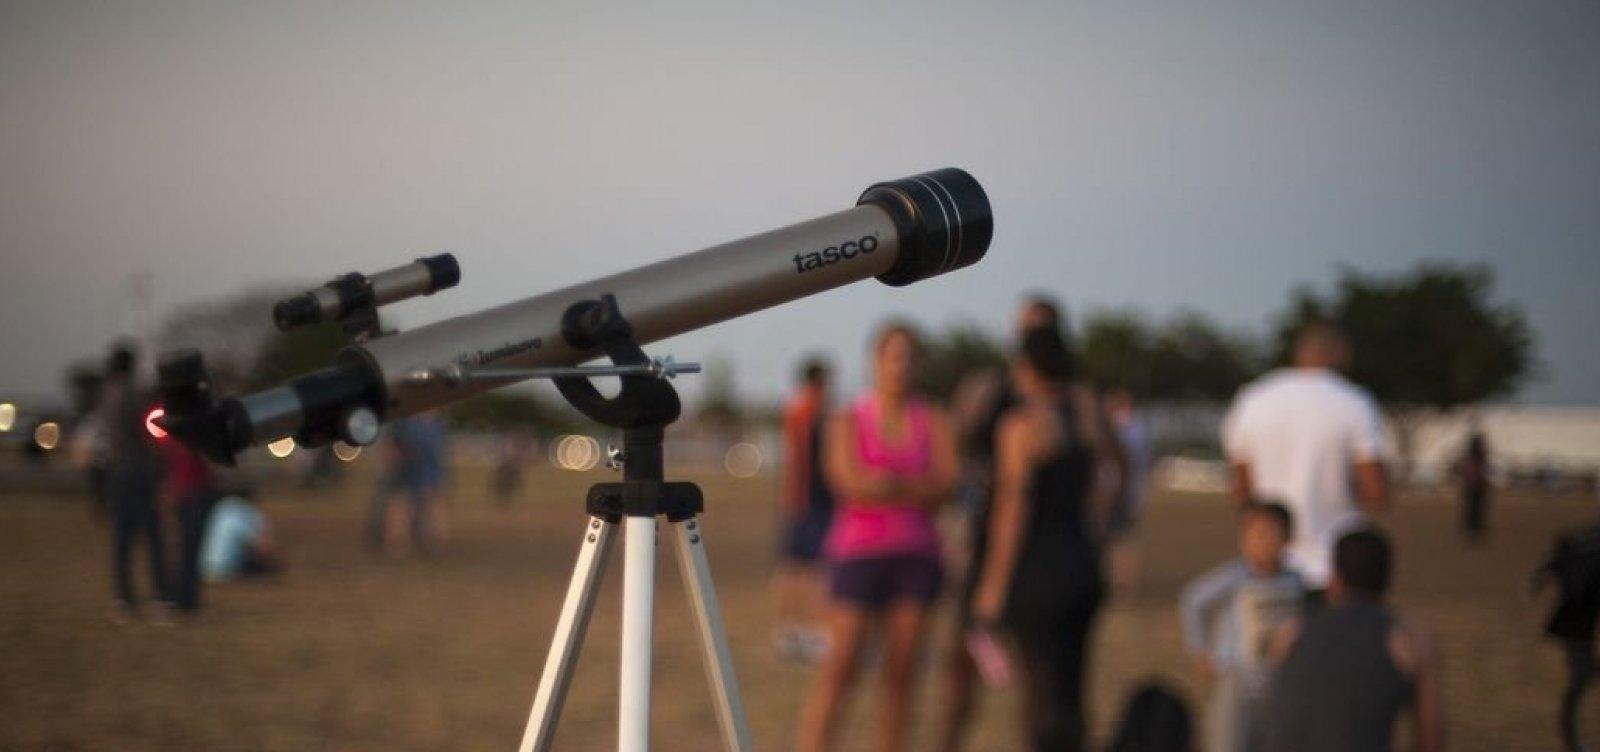 Cerca de 800 mil alunos participam da Olimpíada Brasileira de Astronomia